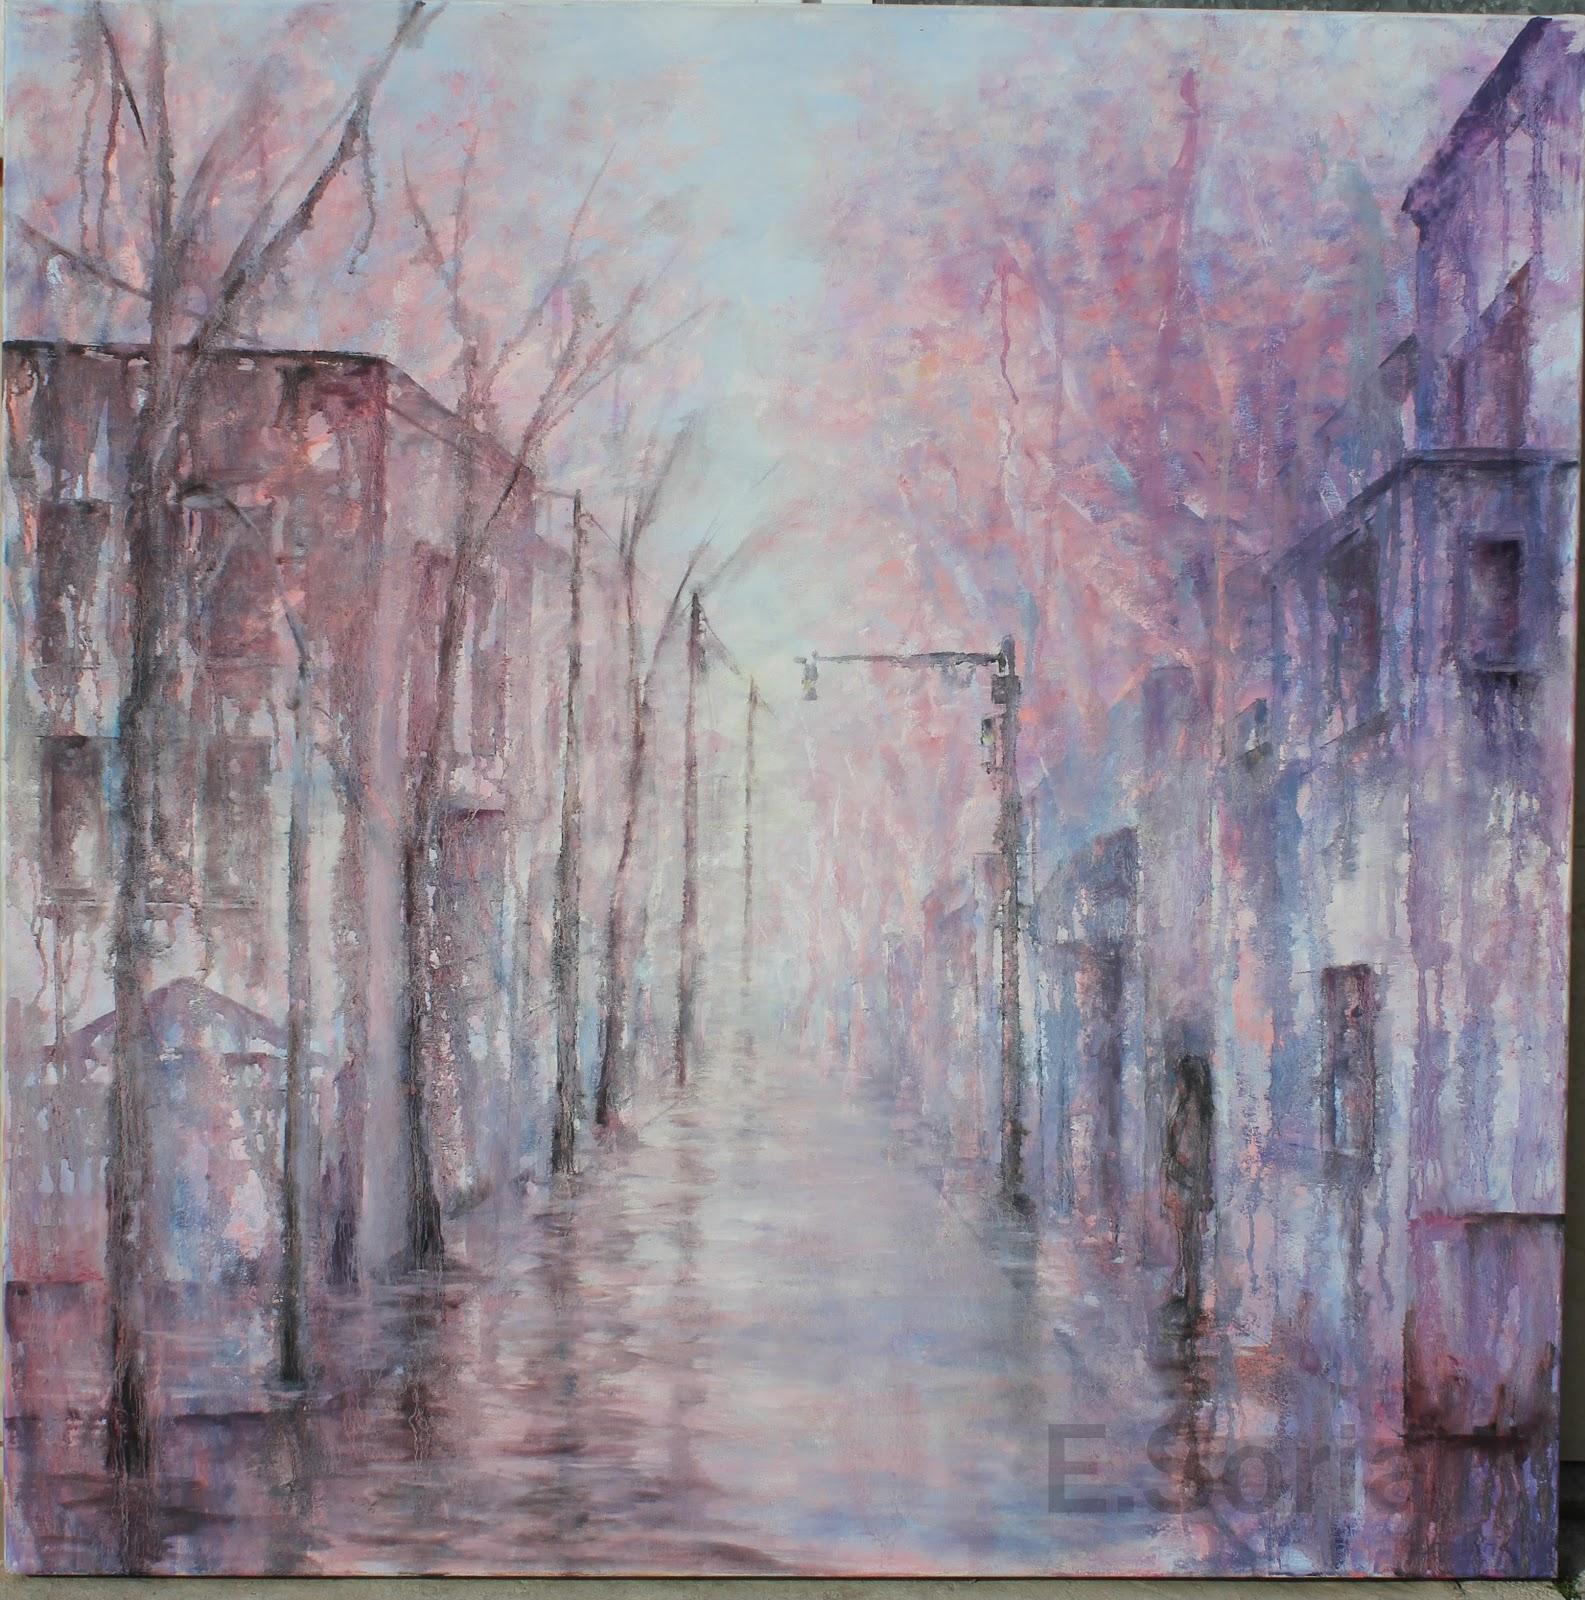 Galeria De Pintura Al Oleo: Galeria E.Soria: Pinturas Al Oleo